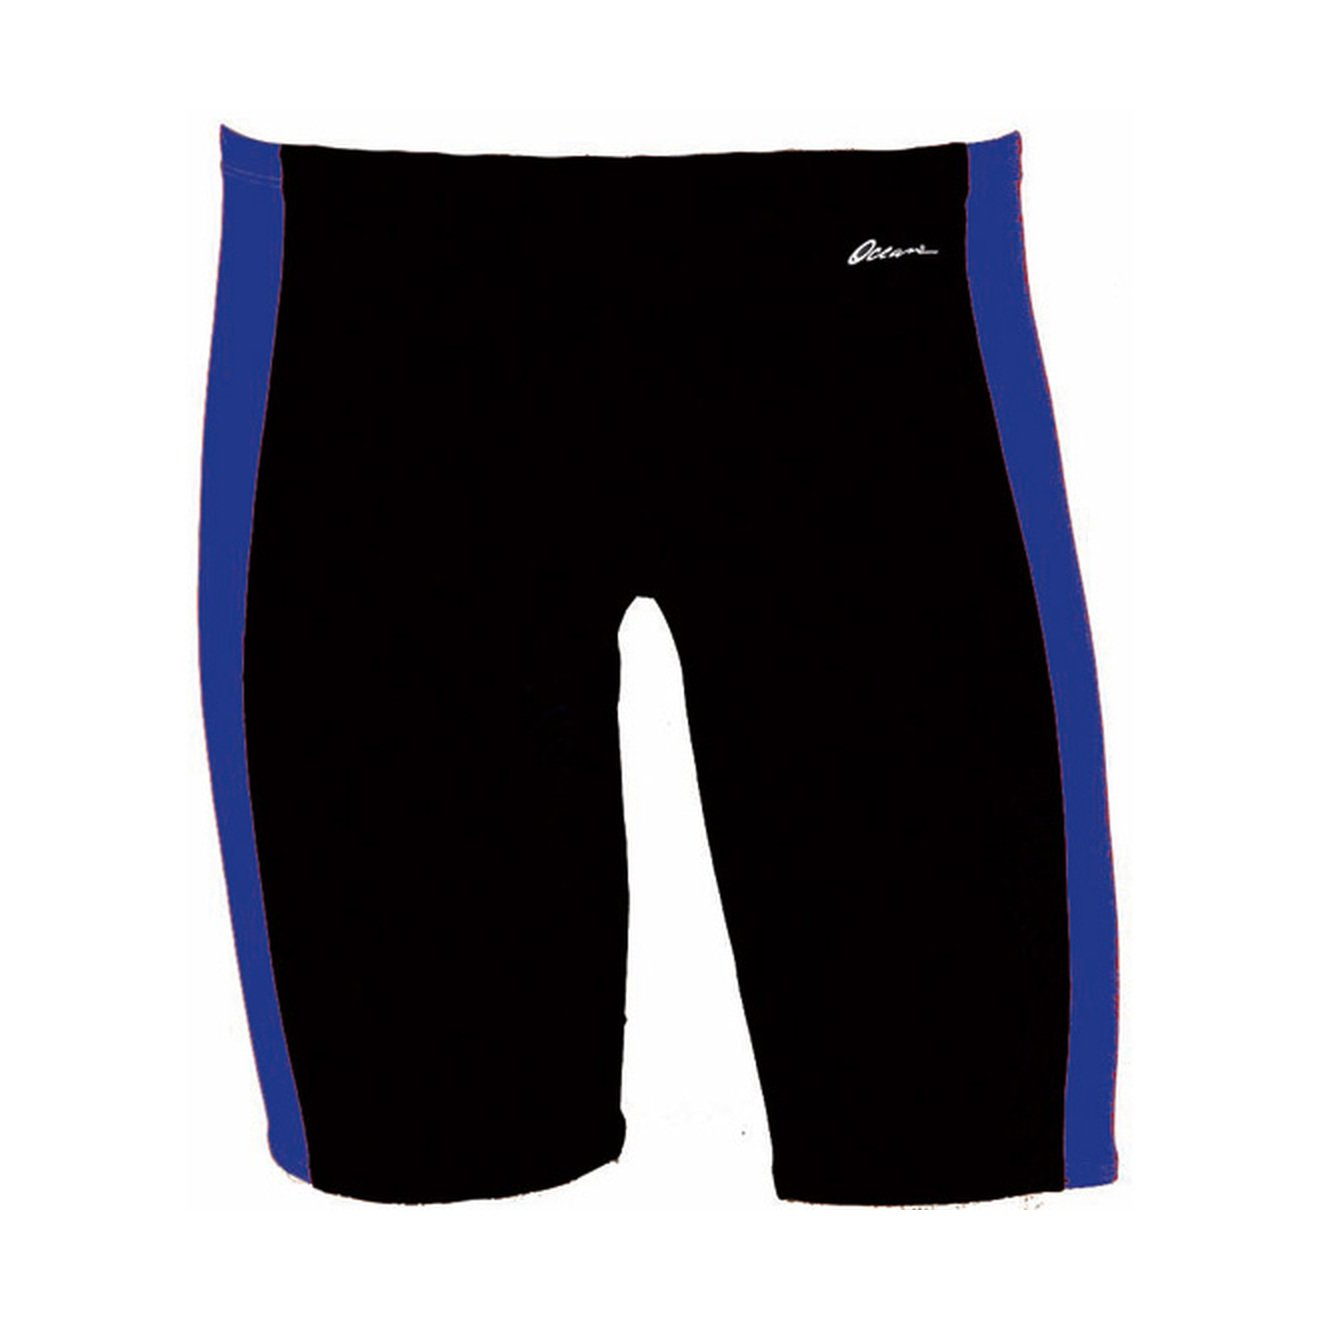 Dolfin Swimwear Ocean Panel Jammer - Black/Royal, 30